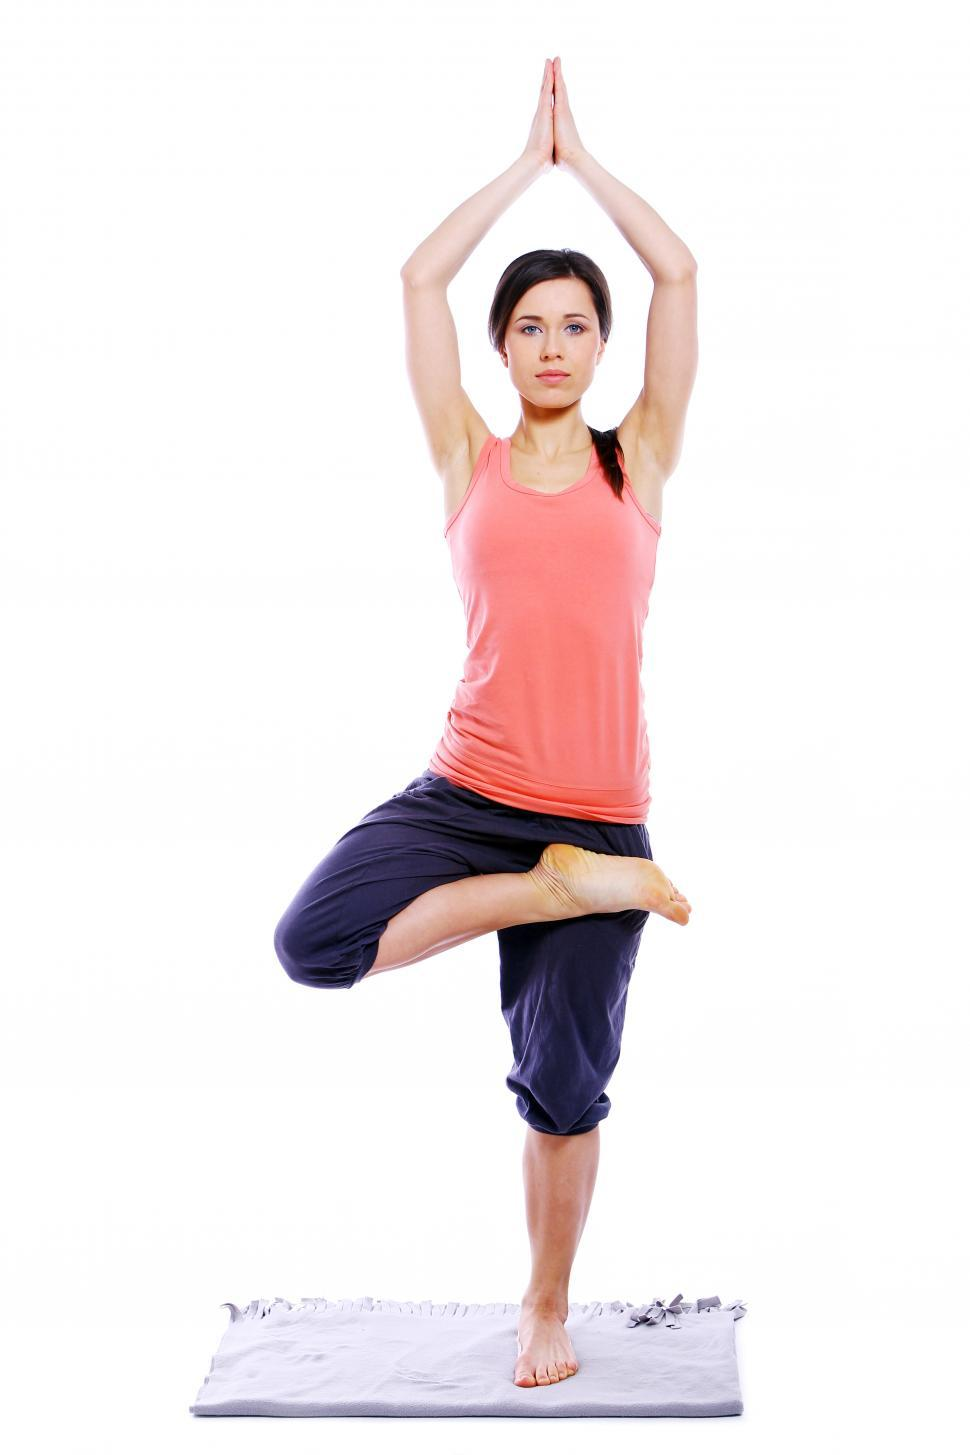 Download Free Stock Photo of Young and woman doing yoga - Tree Pose Half Lotus